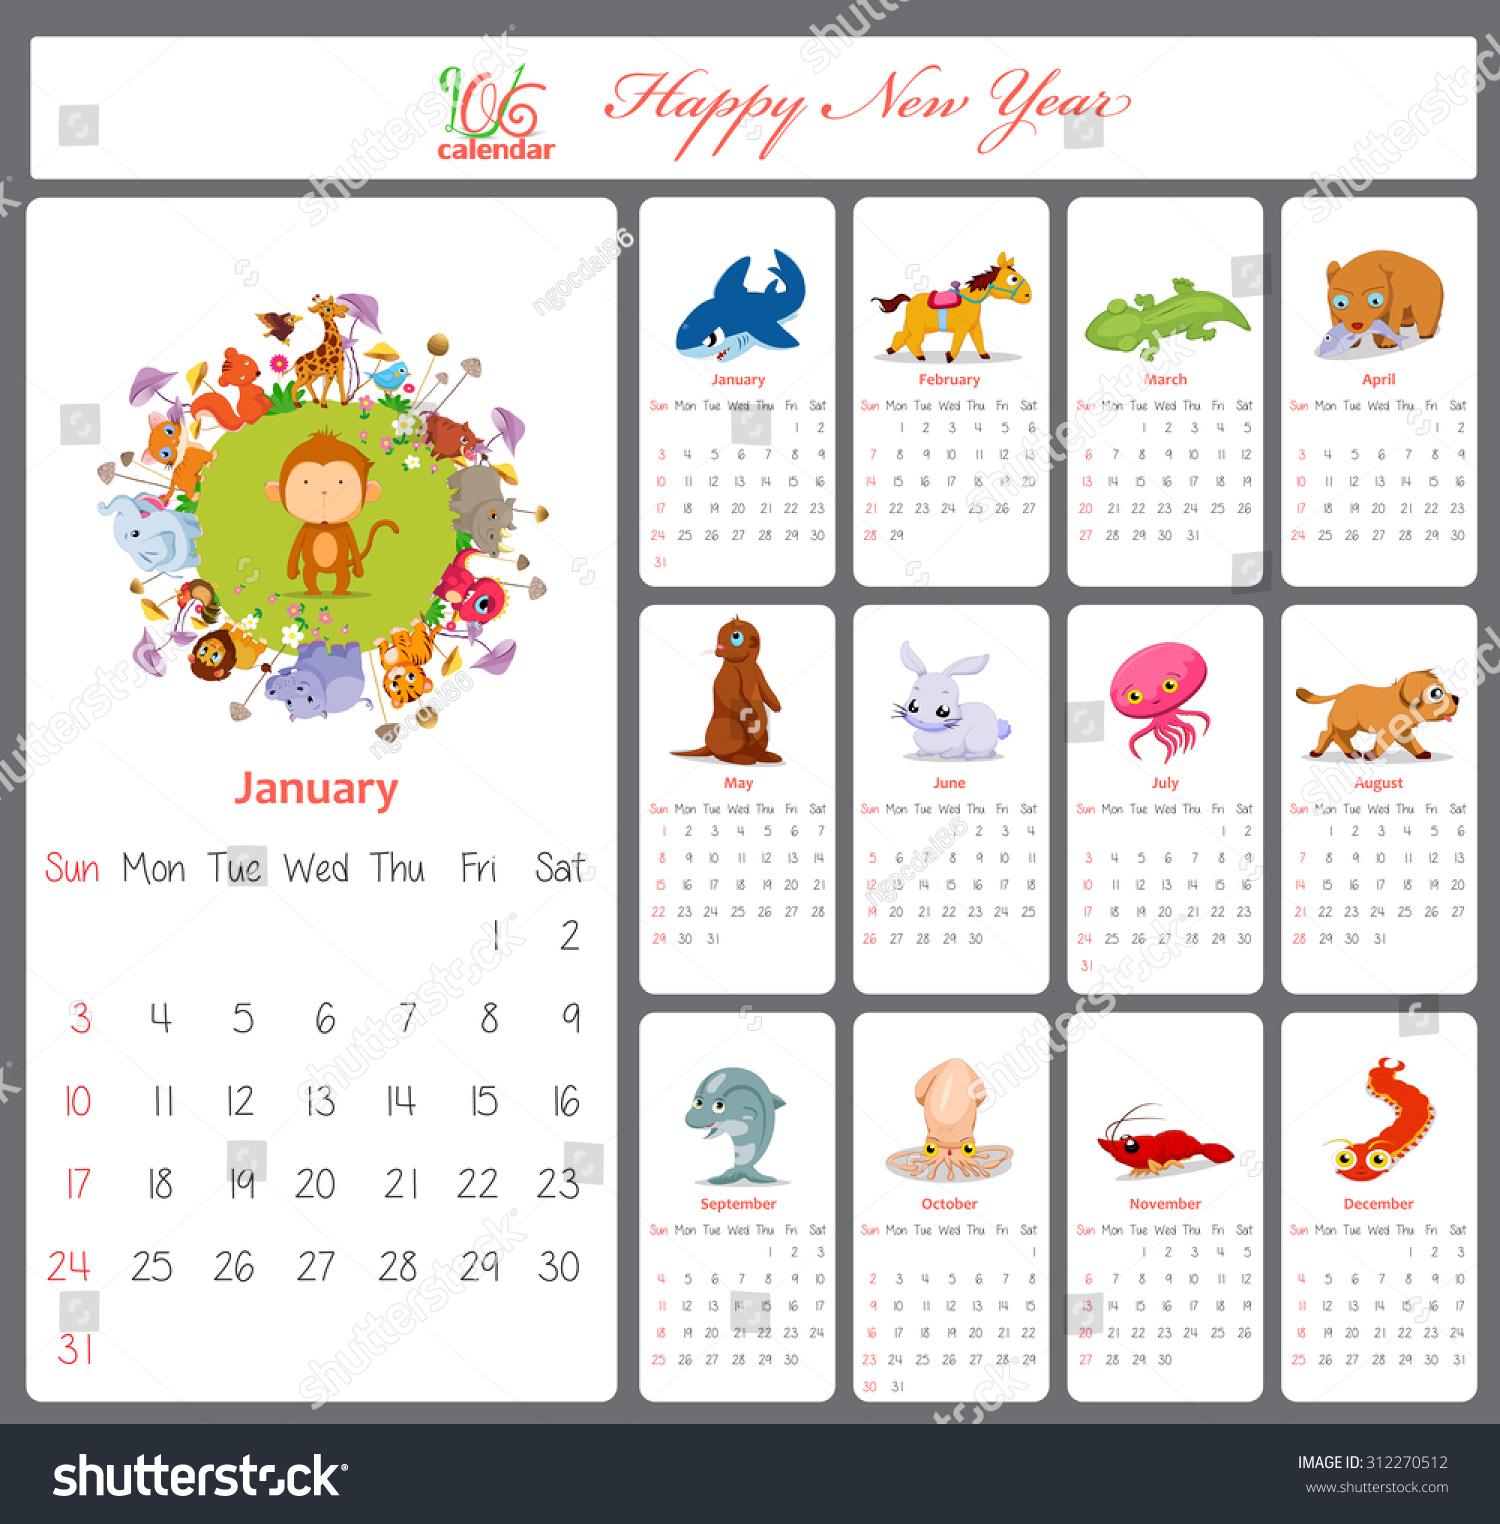 Calendar Illustration List : Unusual calendar cartoon funny animals stock